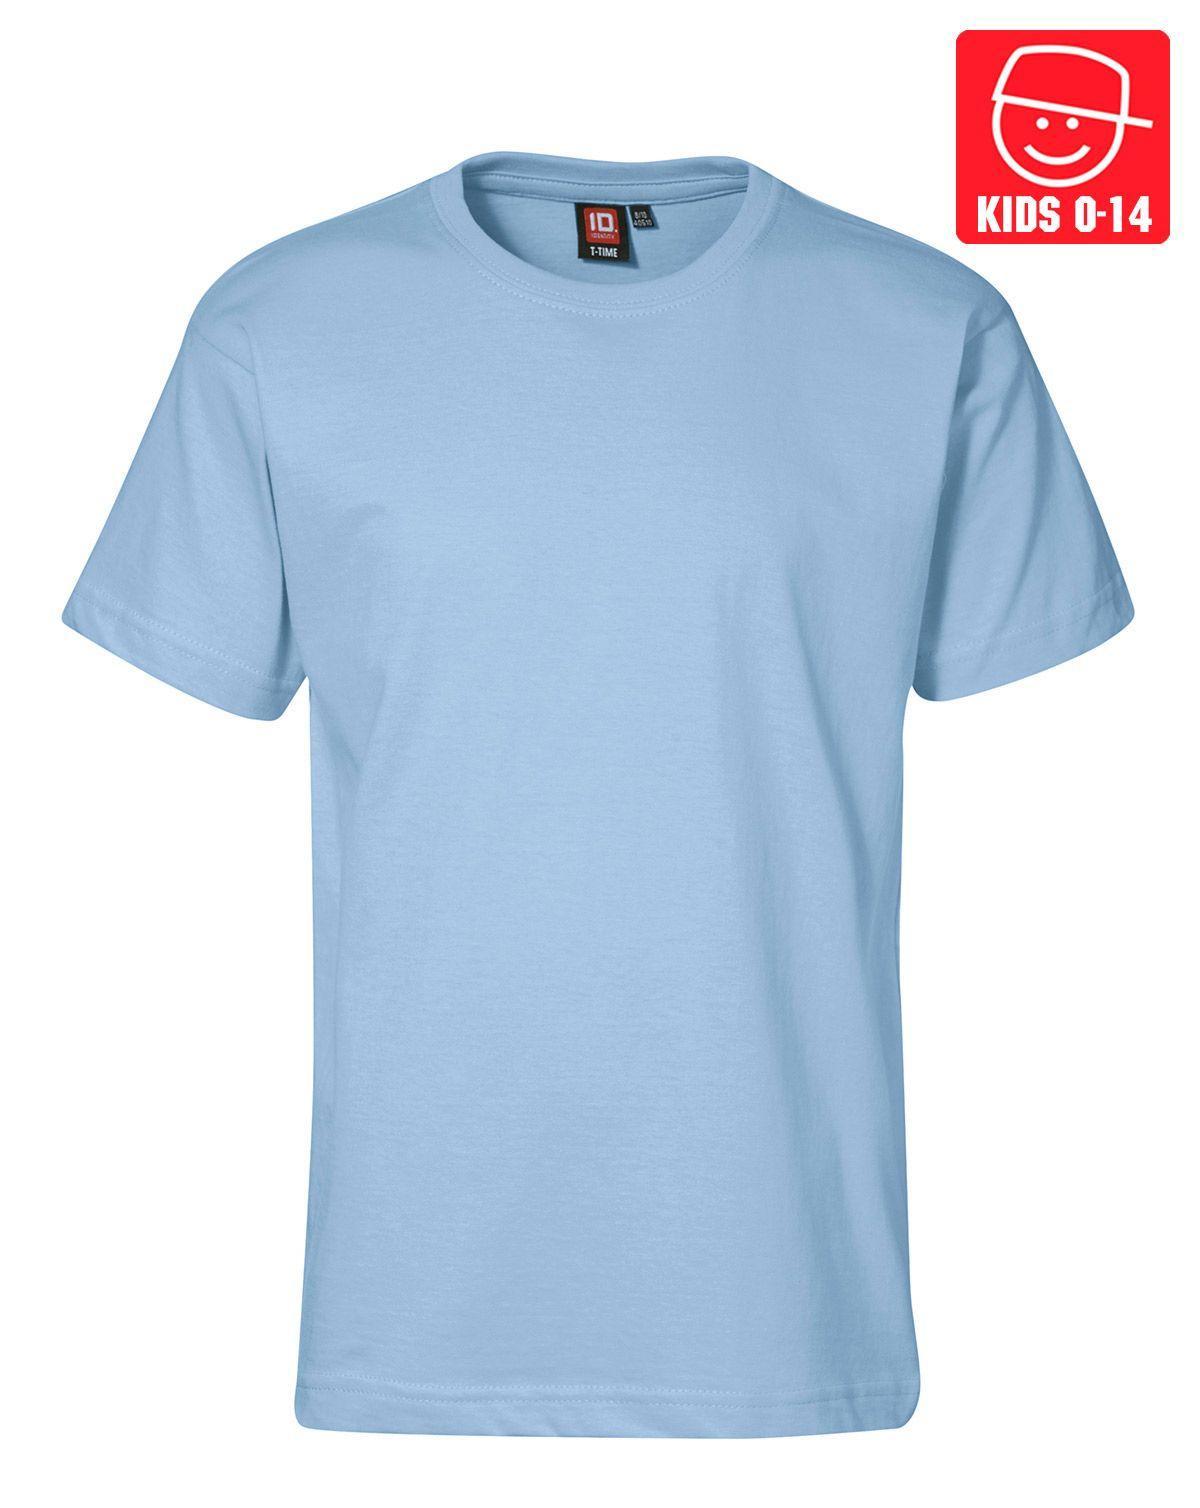 Image of   ID T-TIME T-shirt (Lyseblå, 122)